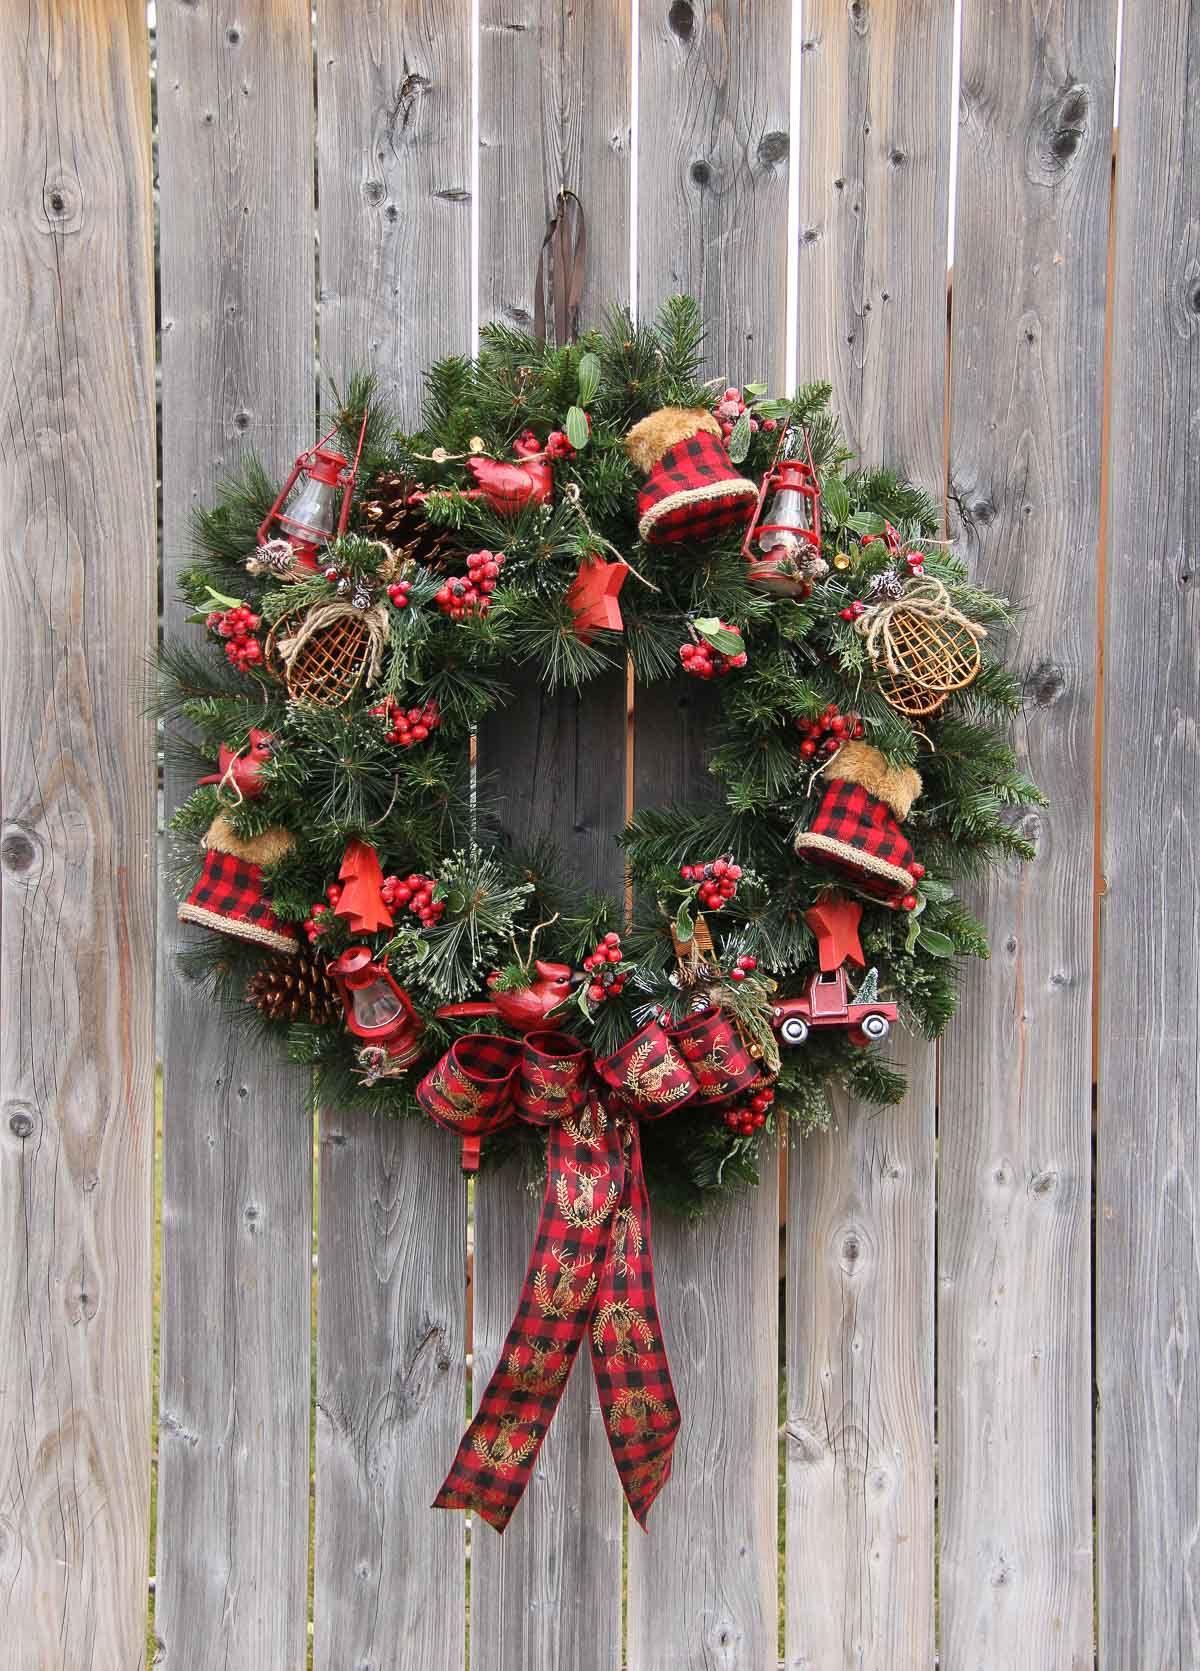 Holiday decor. Christmas decorations. Christmas tree